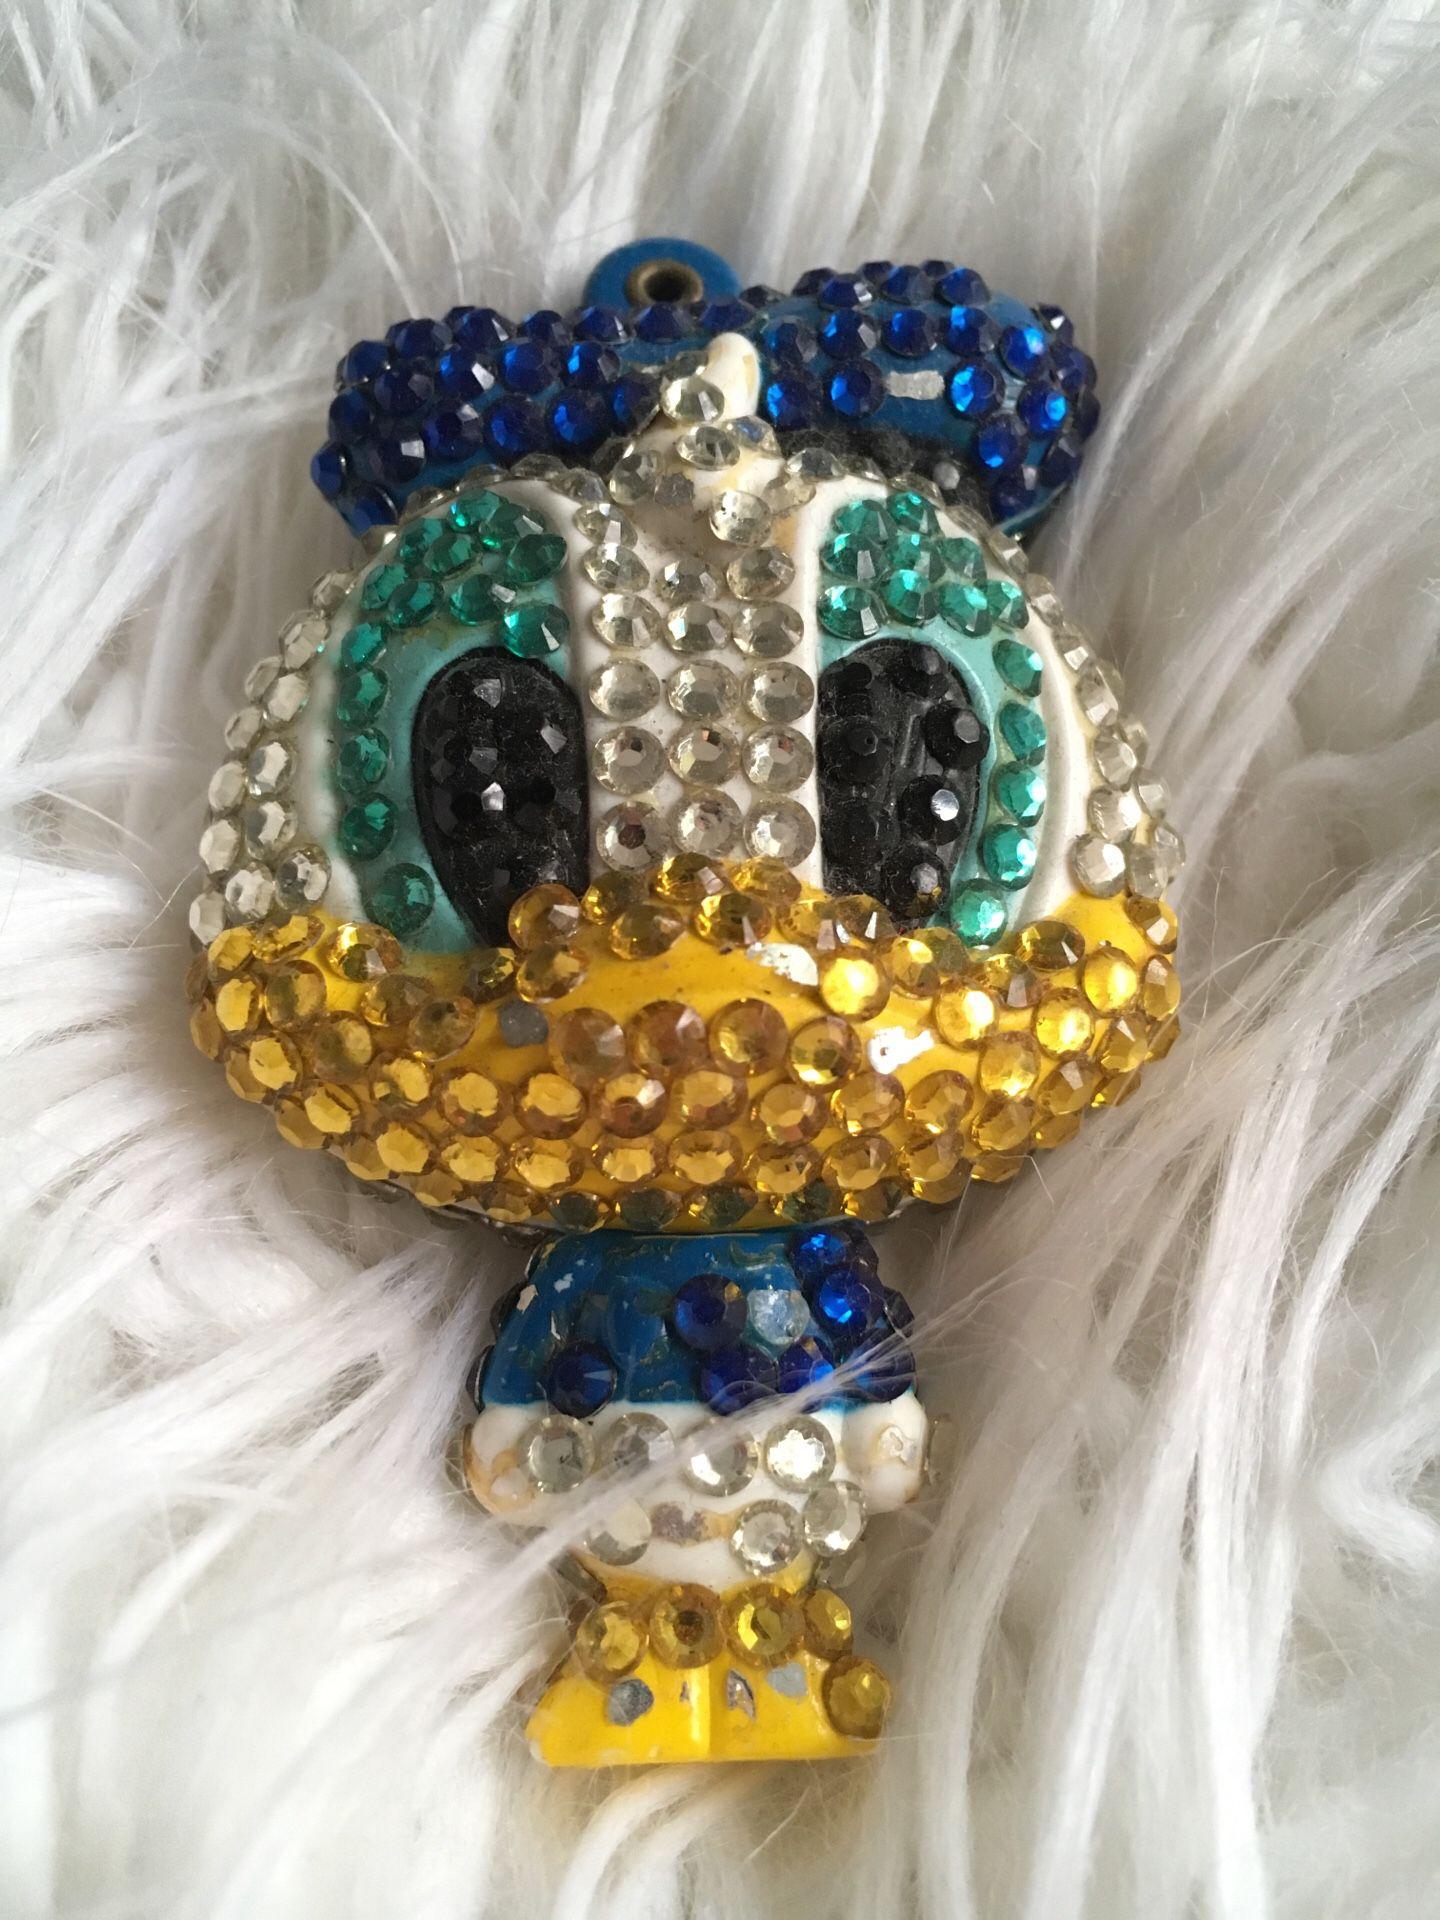 Vintage Donald Duck mirror